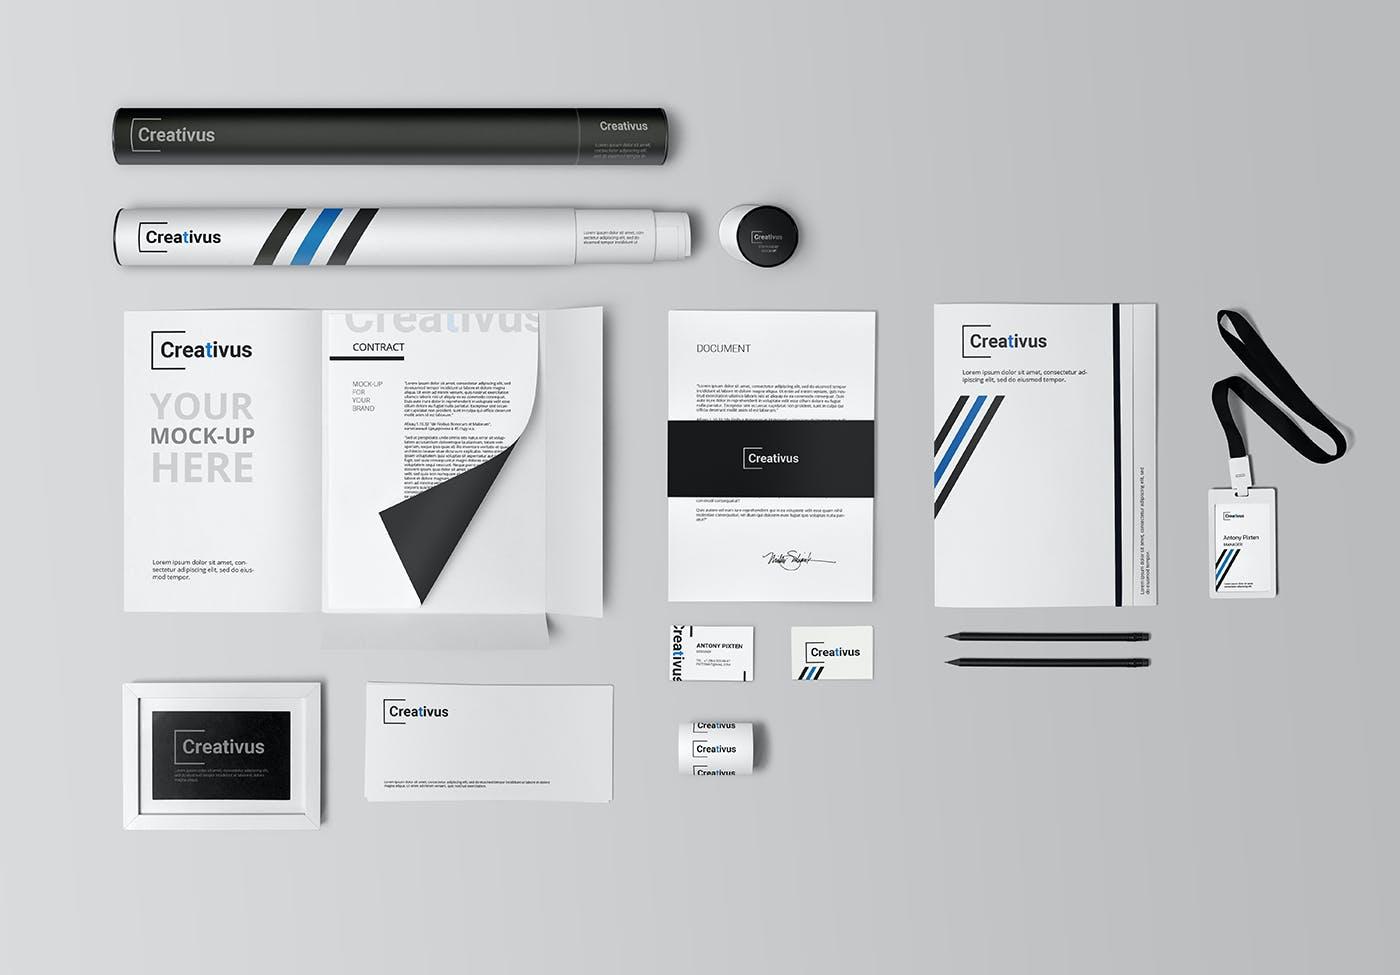 7款品牌LOGO设计办公用品展示贴图样机 Branding Stationery Mockup插图(1)